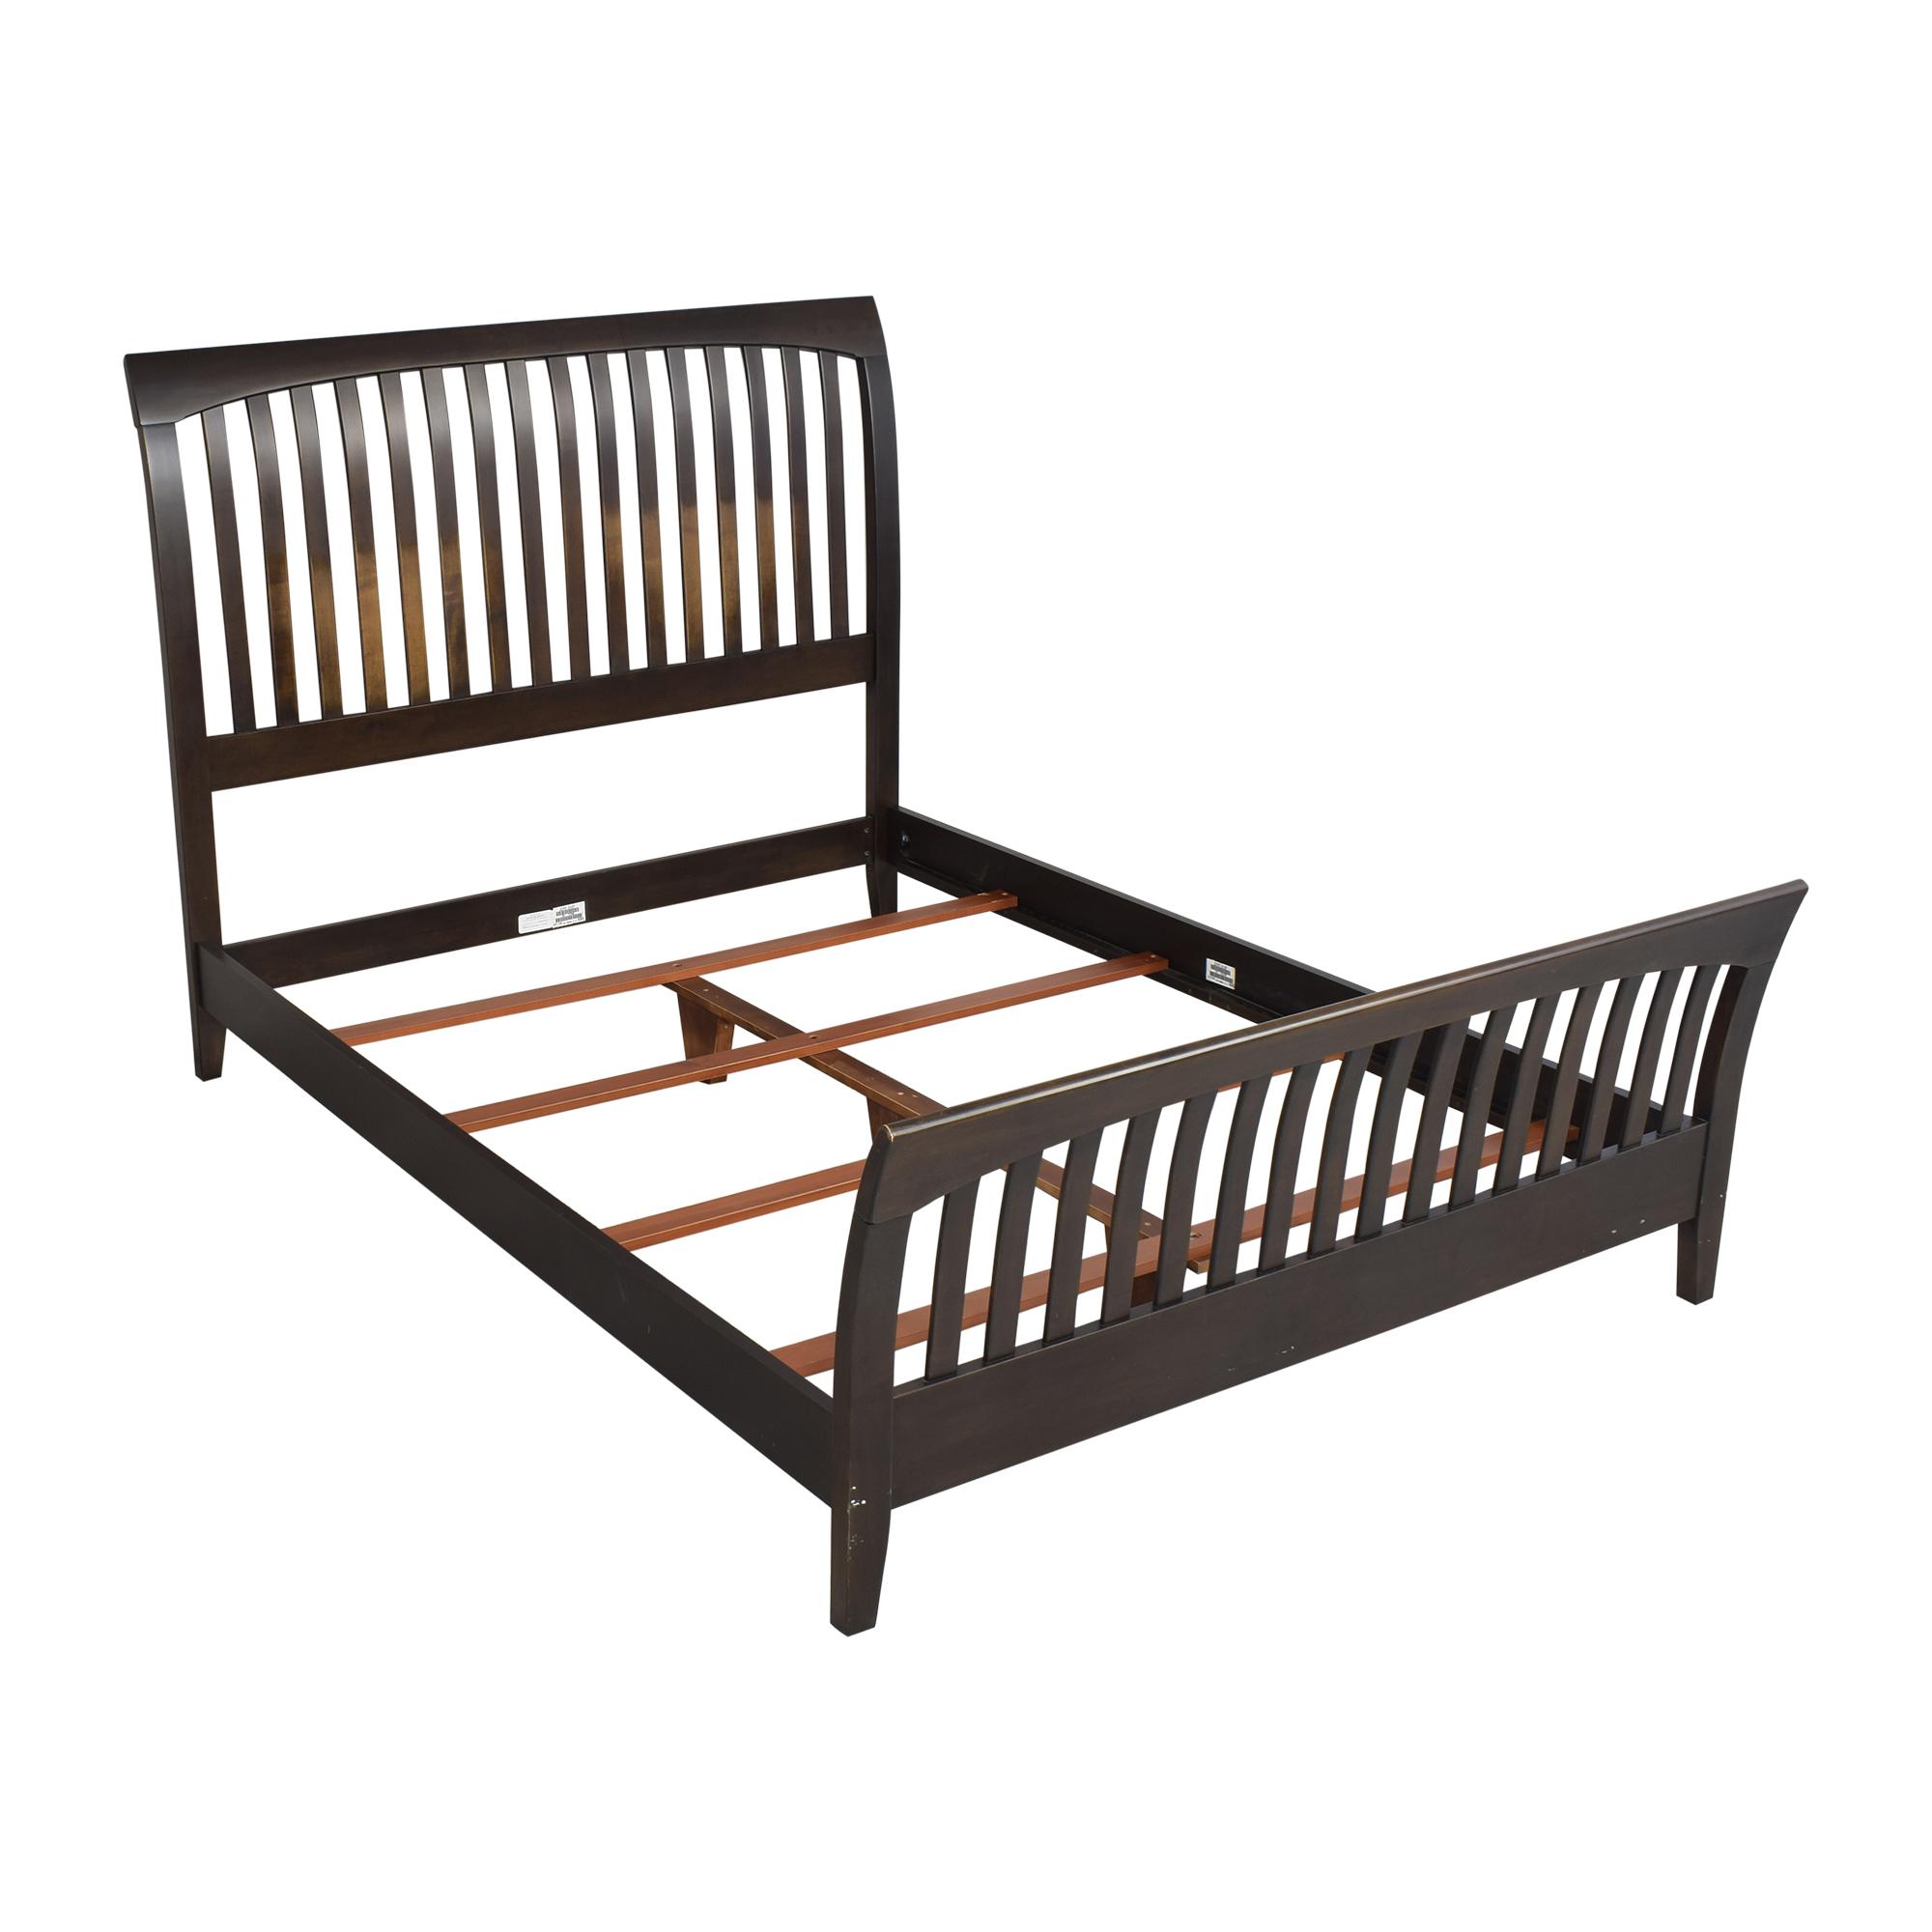 Ethan Allen Ethan Allen American Artisan Mission Queen Bed discount